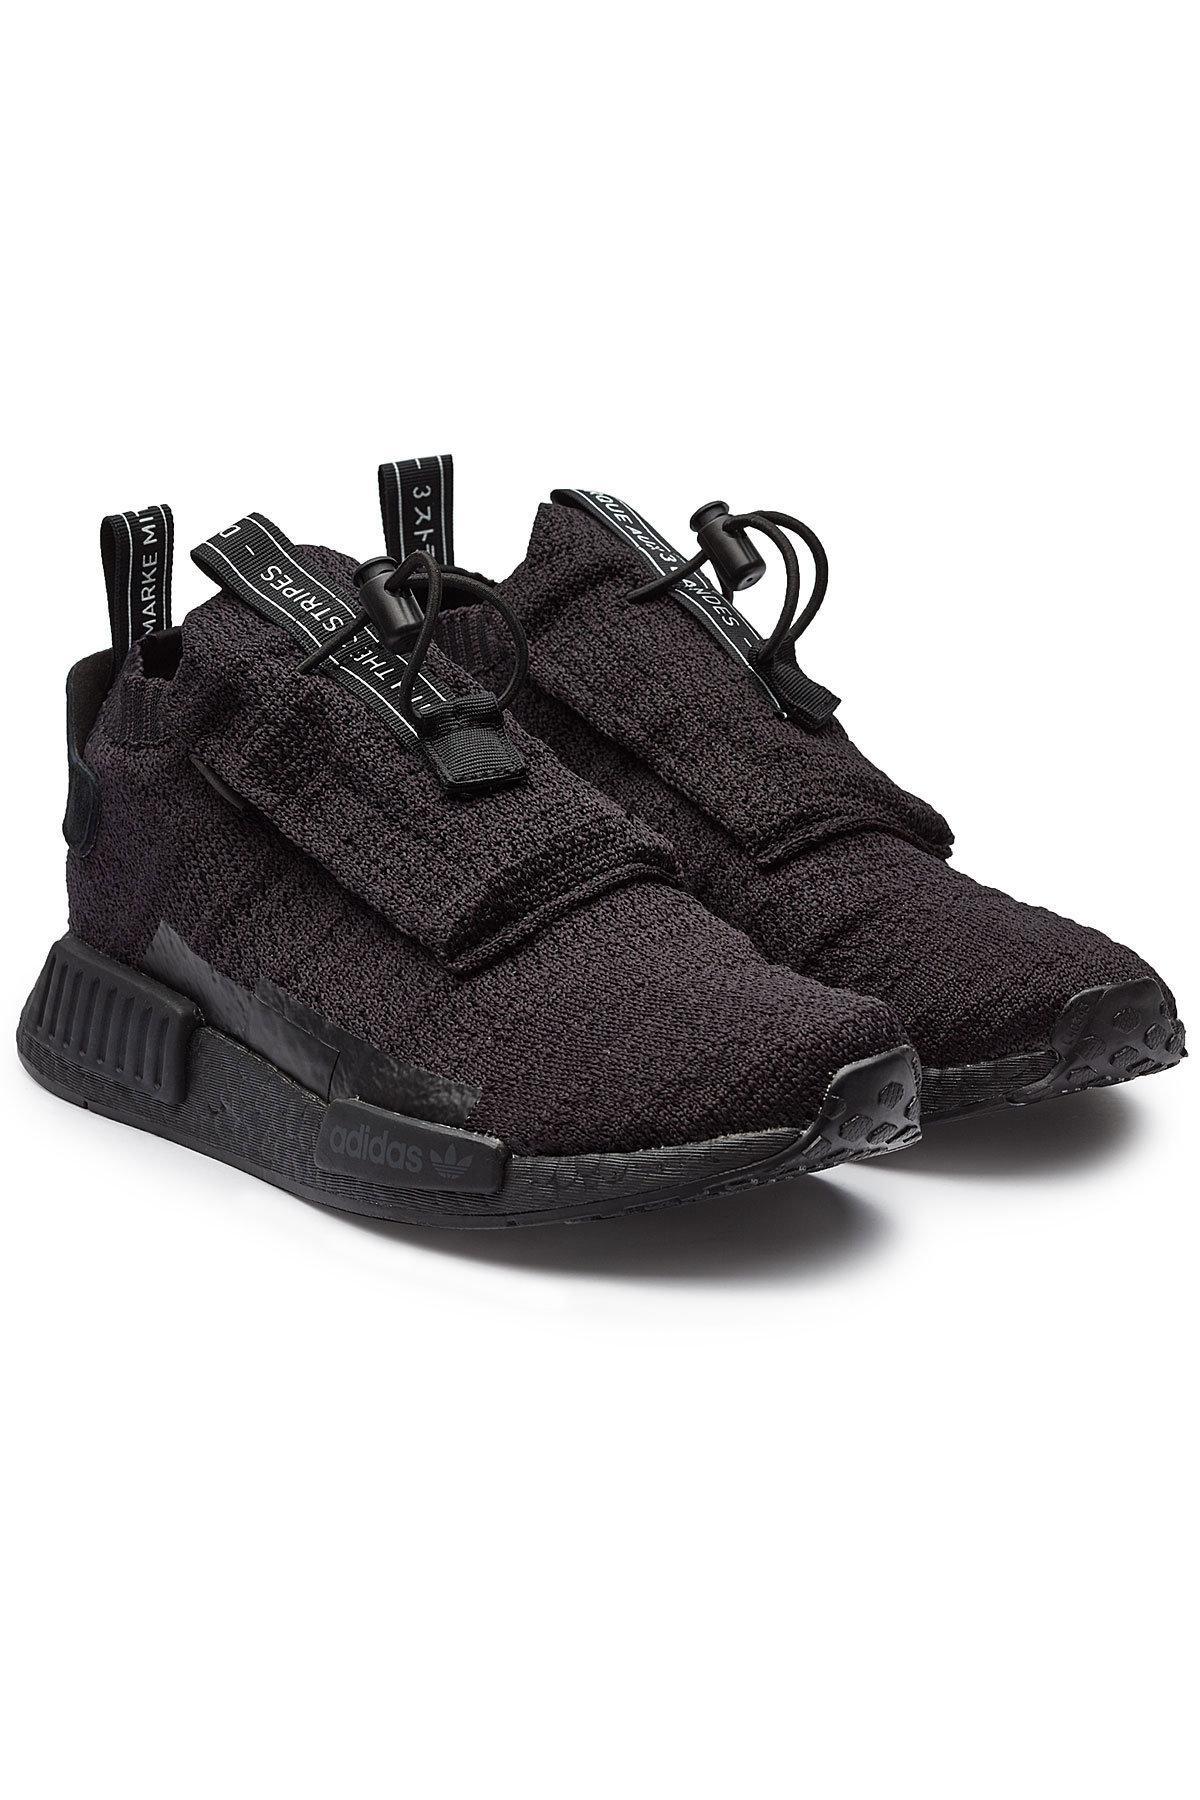 promo code f8dd3 29d4a adidas Originals Nmdts1 Pk Gore-tex Primeknit Sneakers in Bl